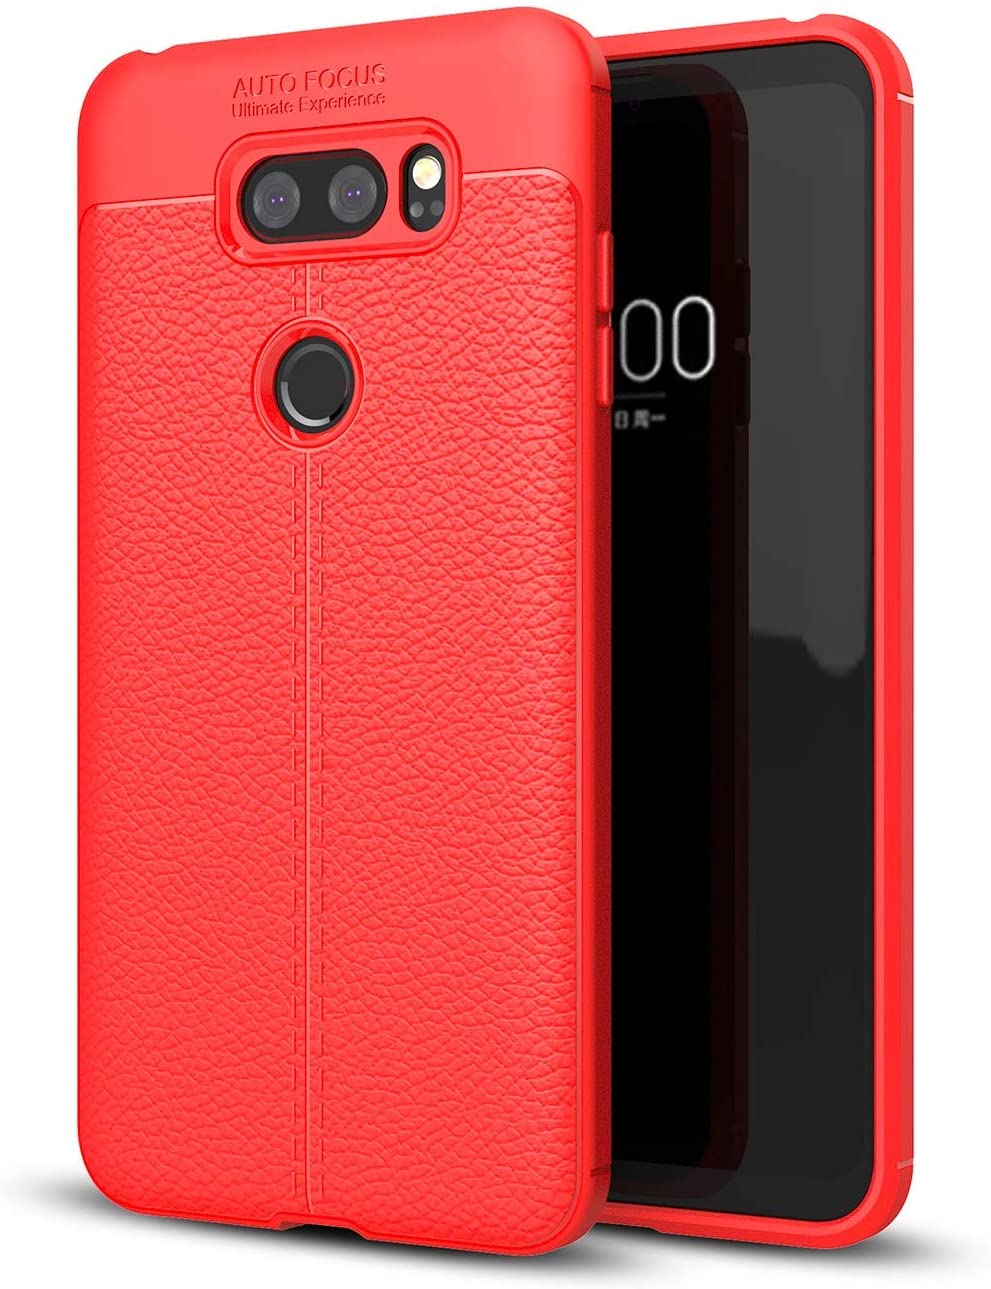 ZYZX LG V30 Case,LG V30 Plus Case Shock Absorption LG V30 Phone Case Slim TPU Cover Flexible Bumper Carbon Fiber Protective LG V30 / LG V30 Plus Case-Red